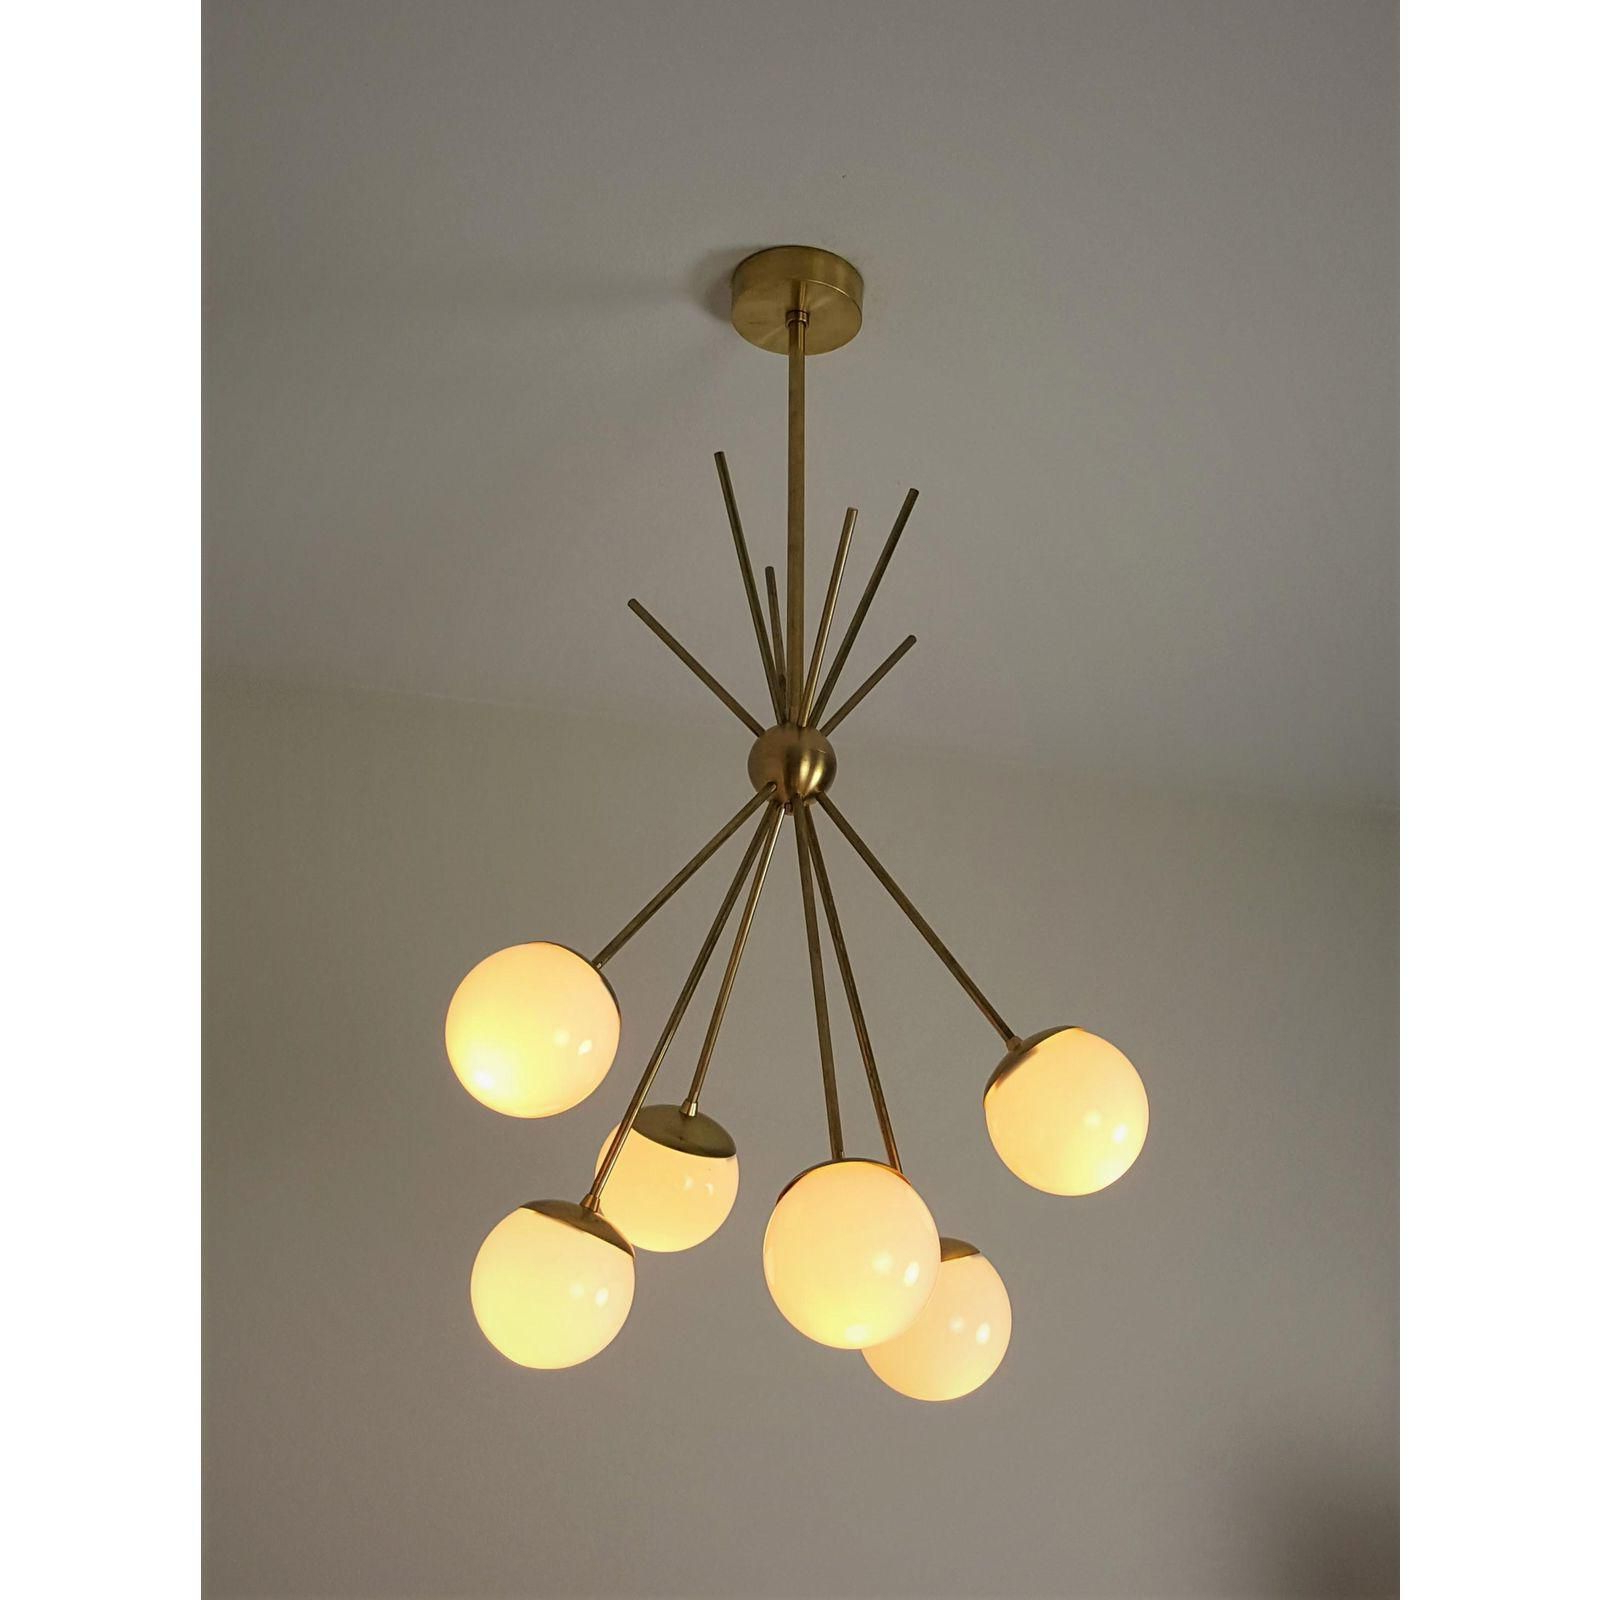 "Well Known Burst"" Model 220 Chandelierblueprint Lighting – Image 5 Pertaining To Bautista 5 Light Sputnik Chandeliers (View 16 of 20)"